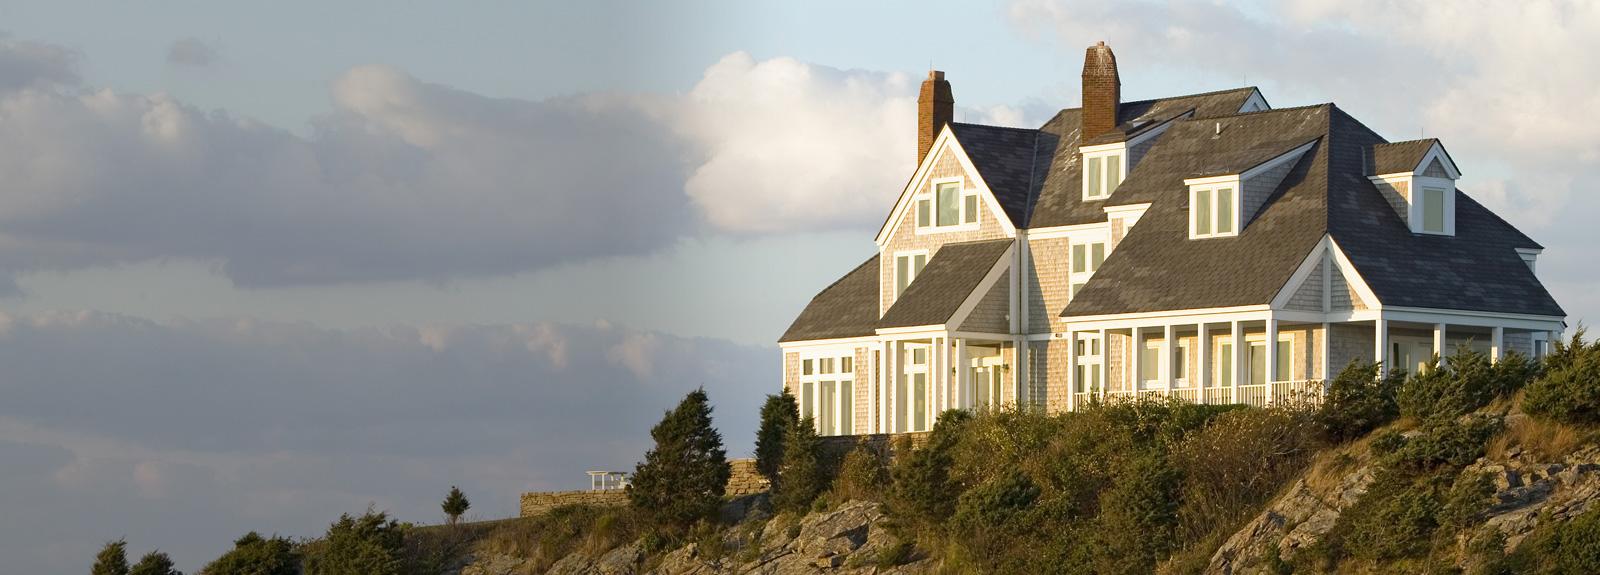 Rhode Island home warranty companies